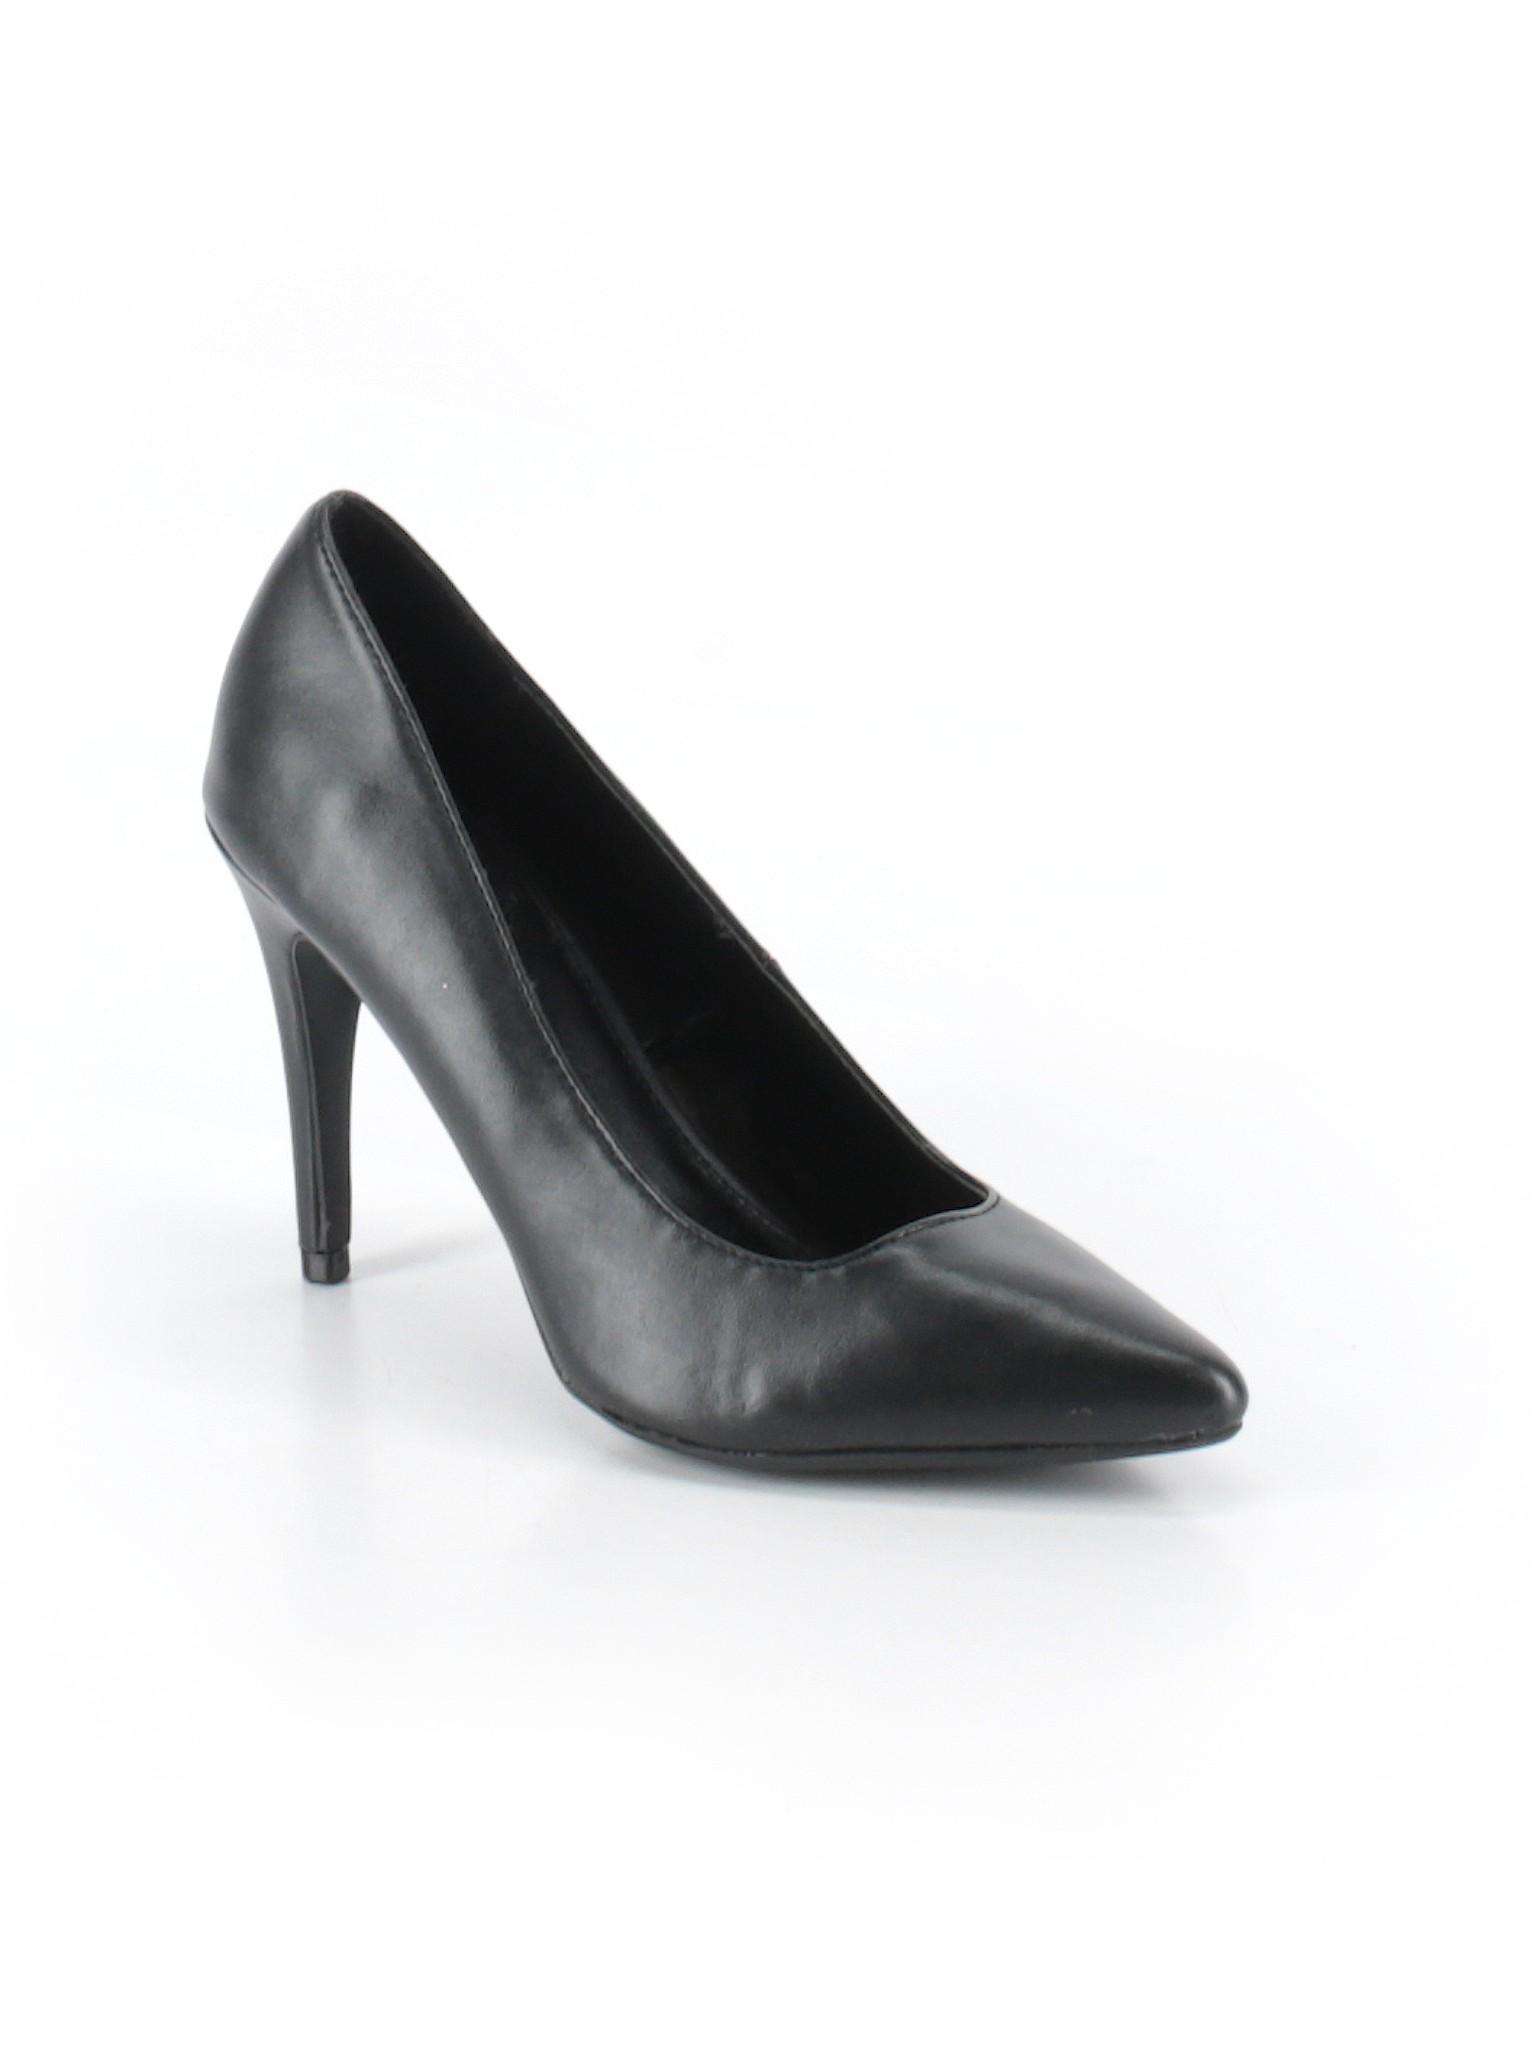 Boutique promotion Boutique NY amp;C Heels promotion f80fgFqw